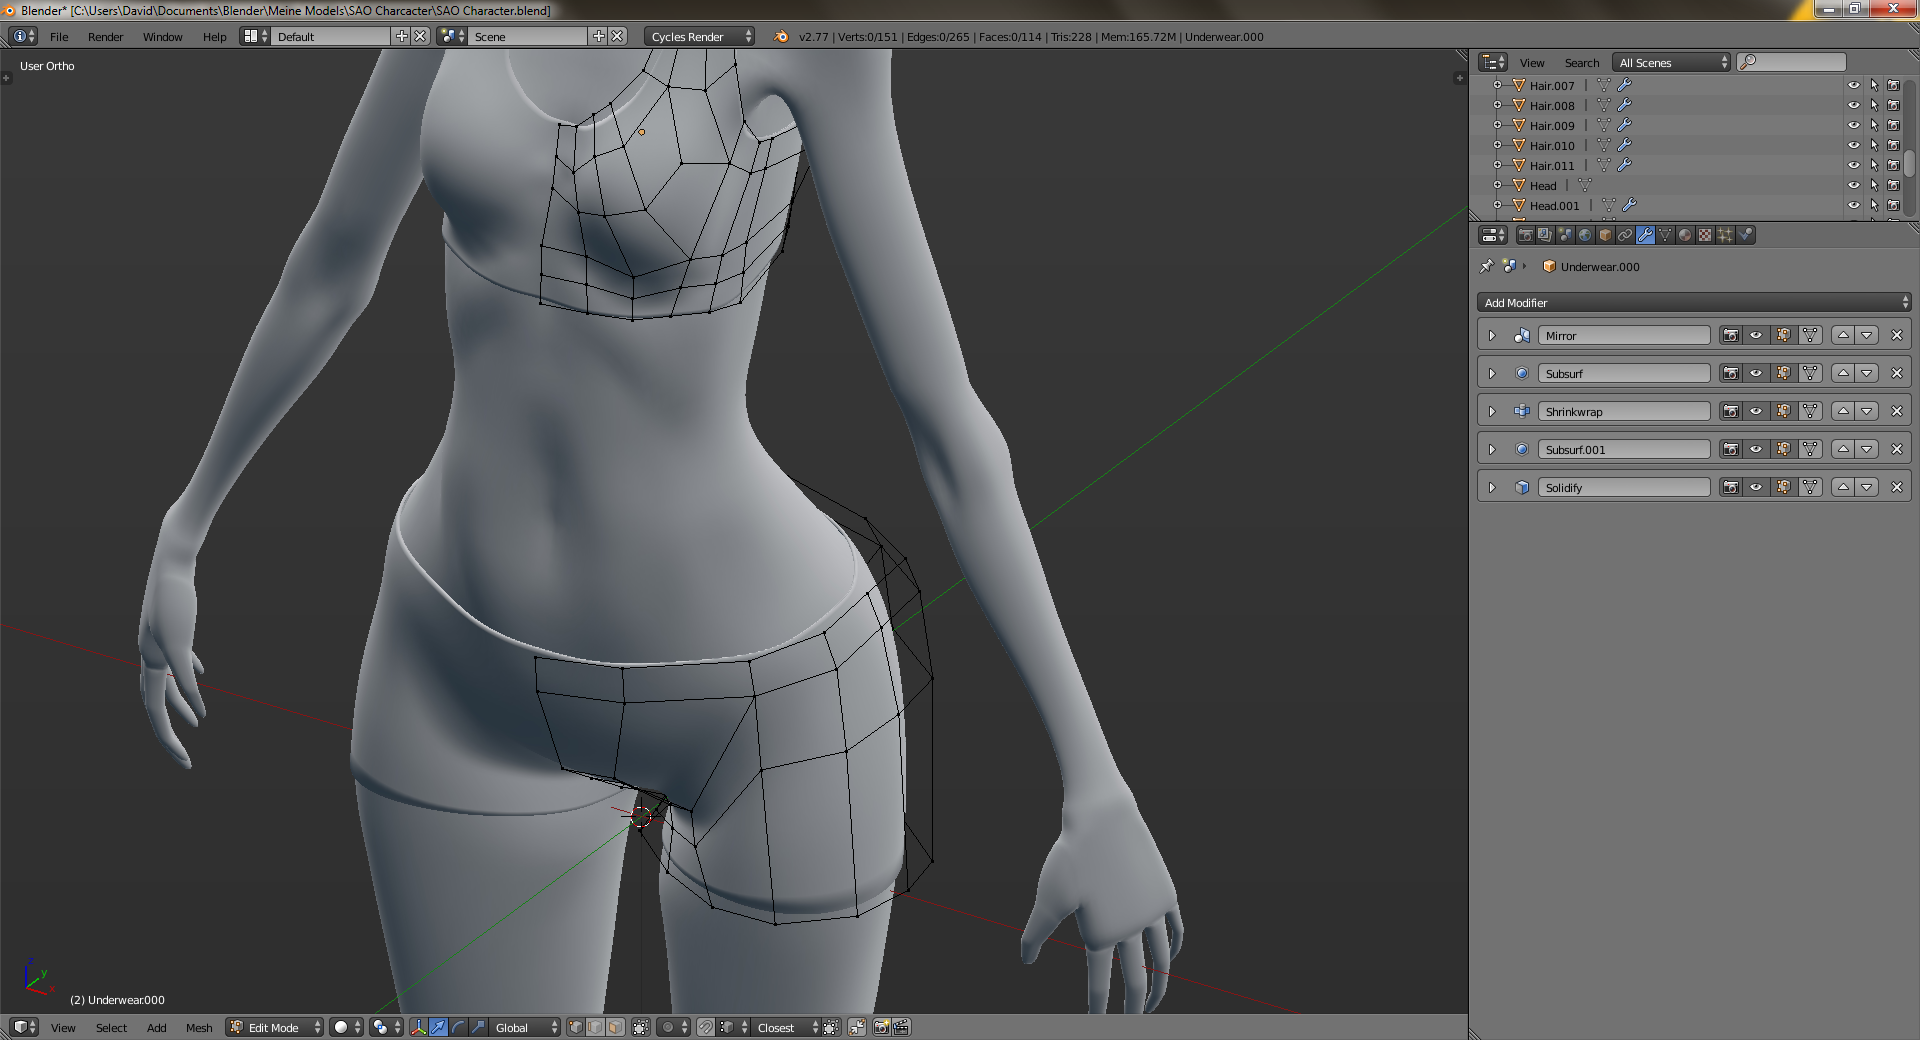 Blender Character Modeling 4 Of 10 : Quick tip for modeling skin tight clothes in blender